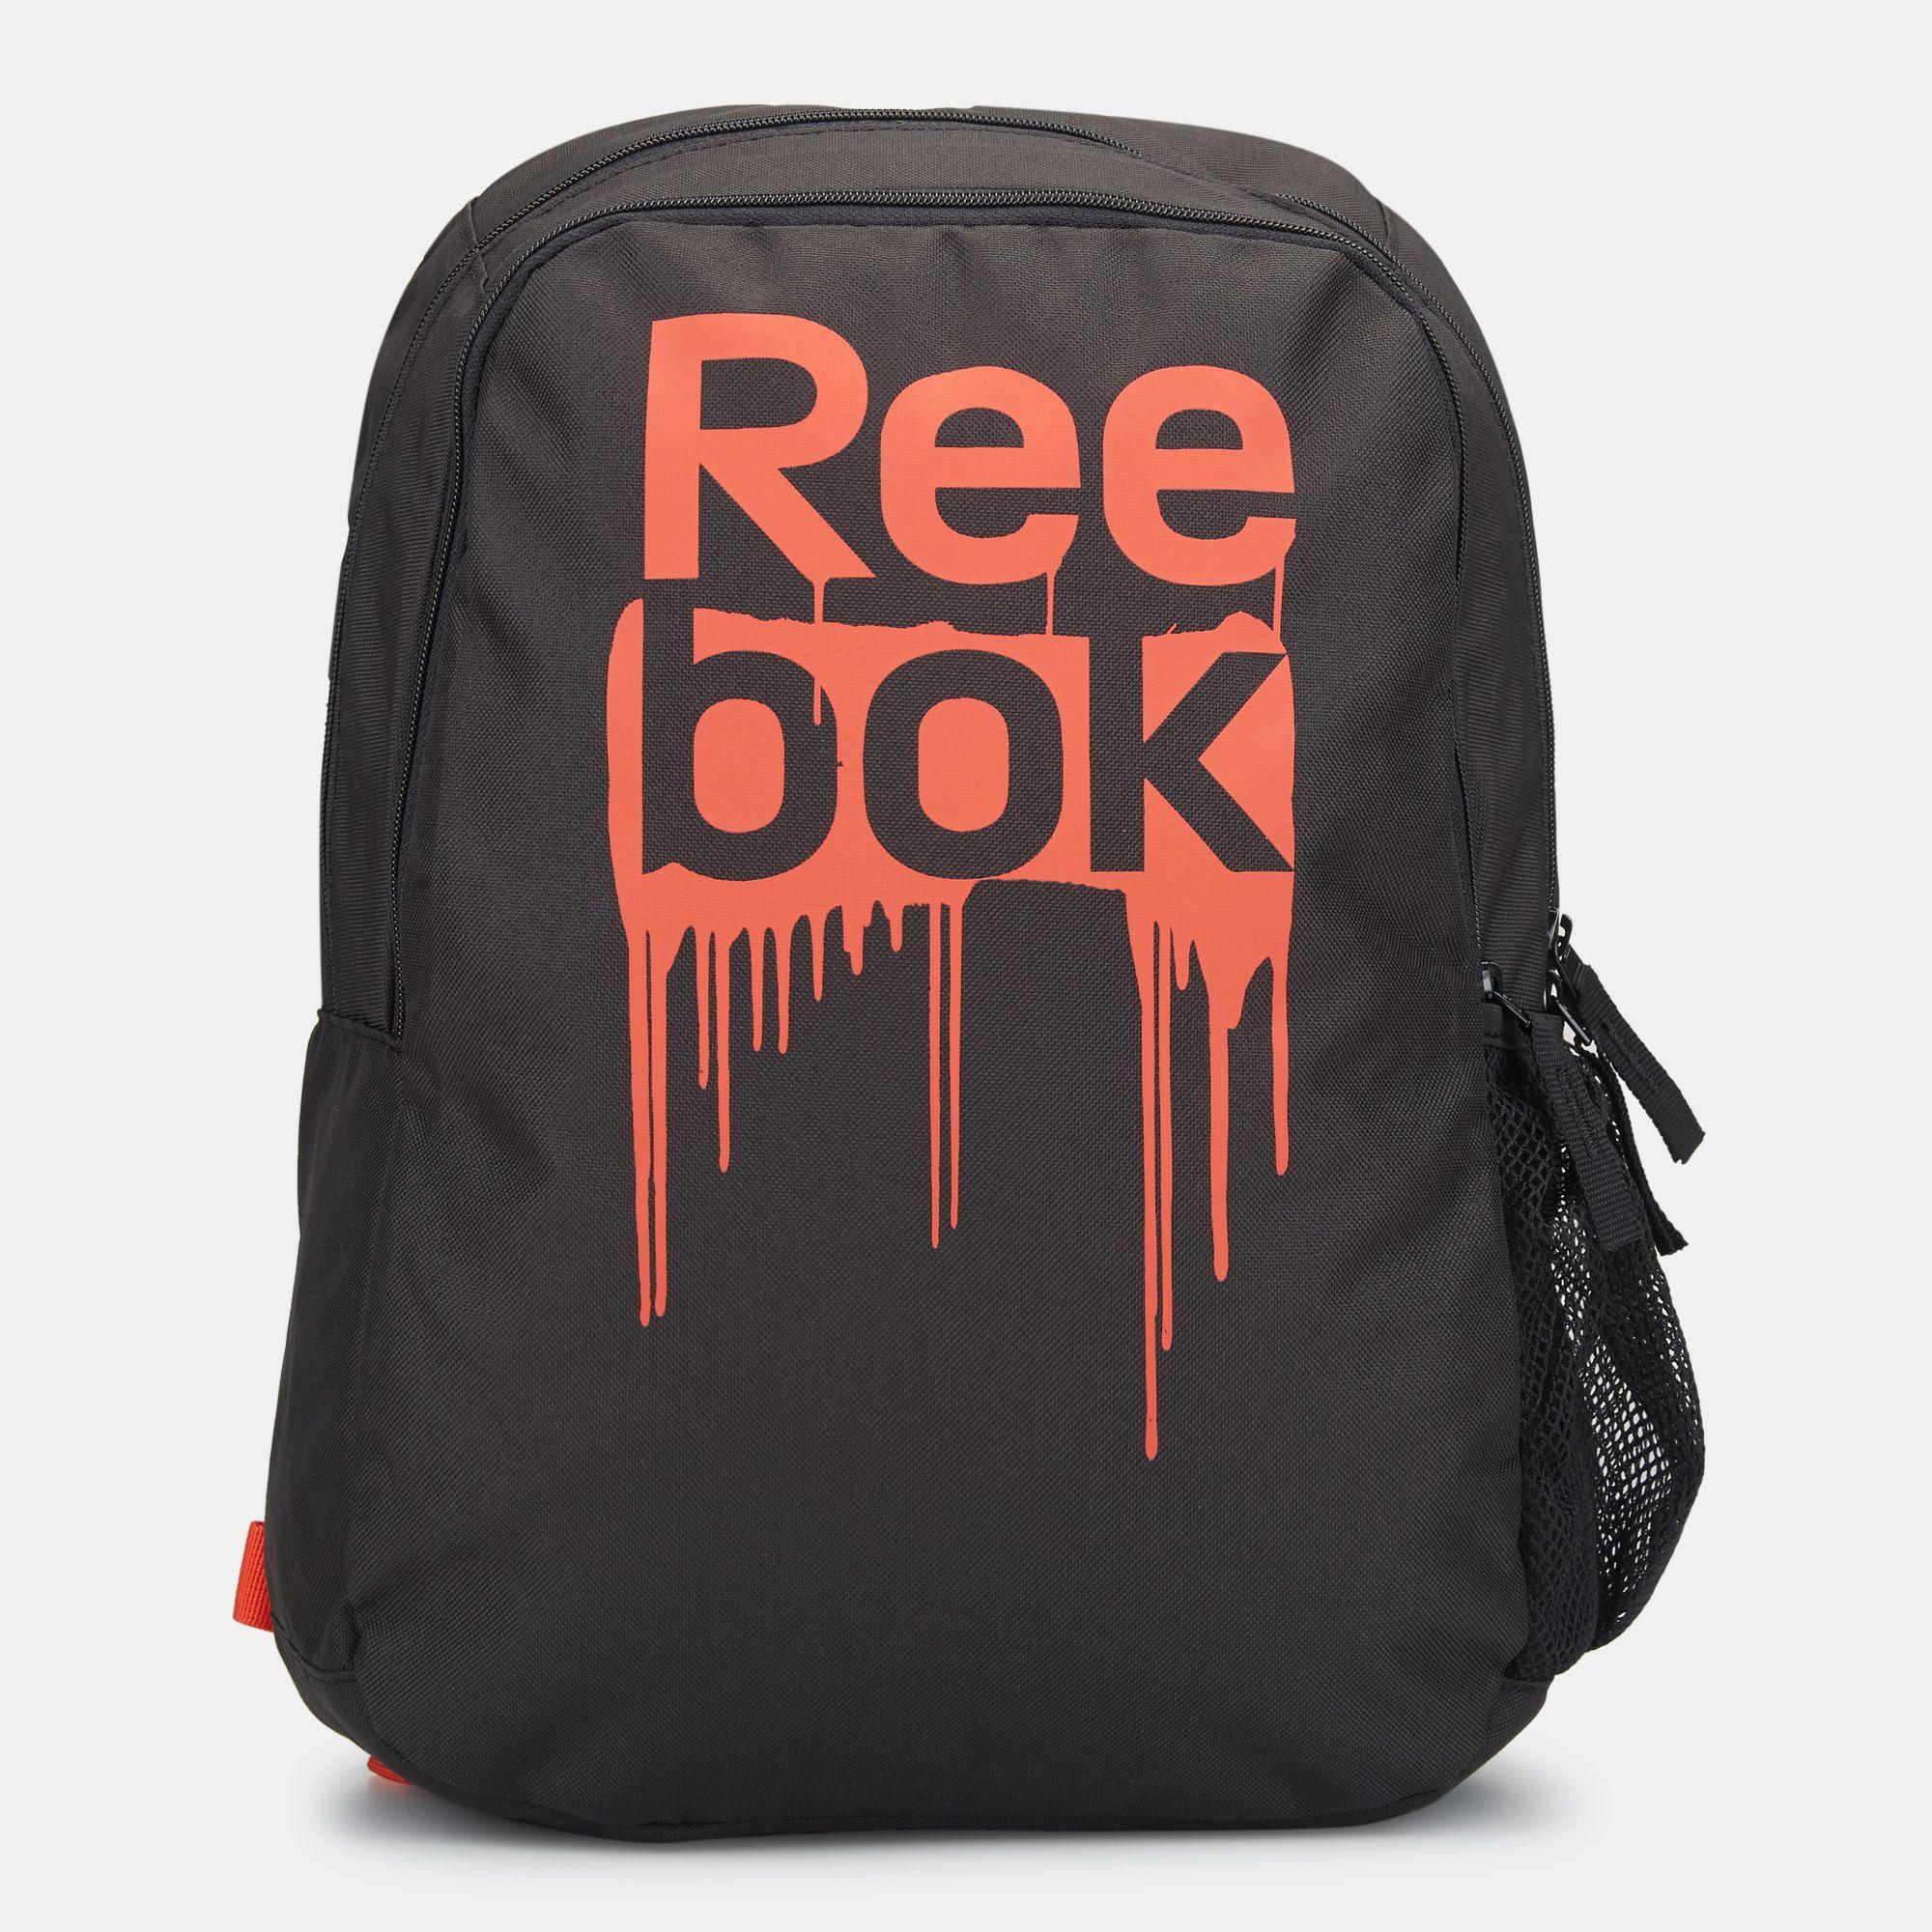 Reebok Small Sport Backpack